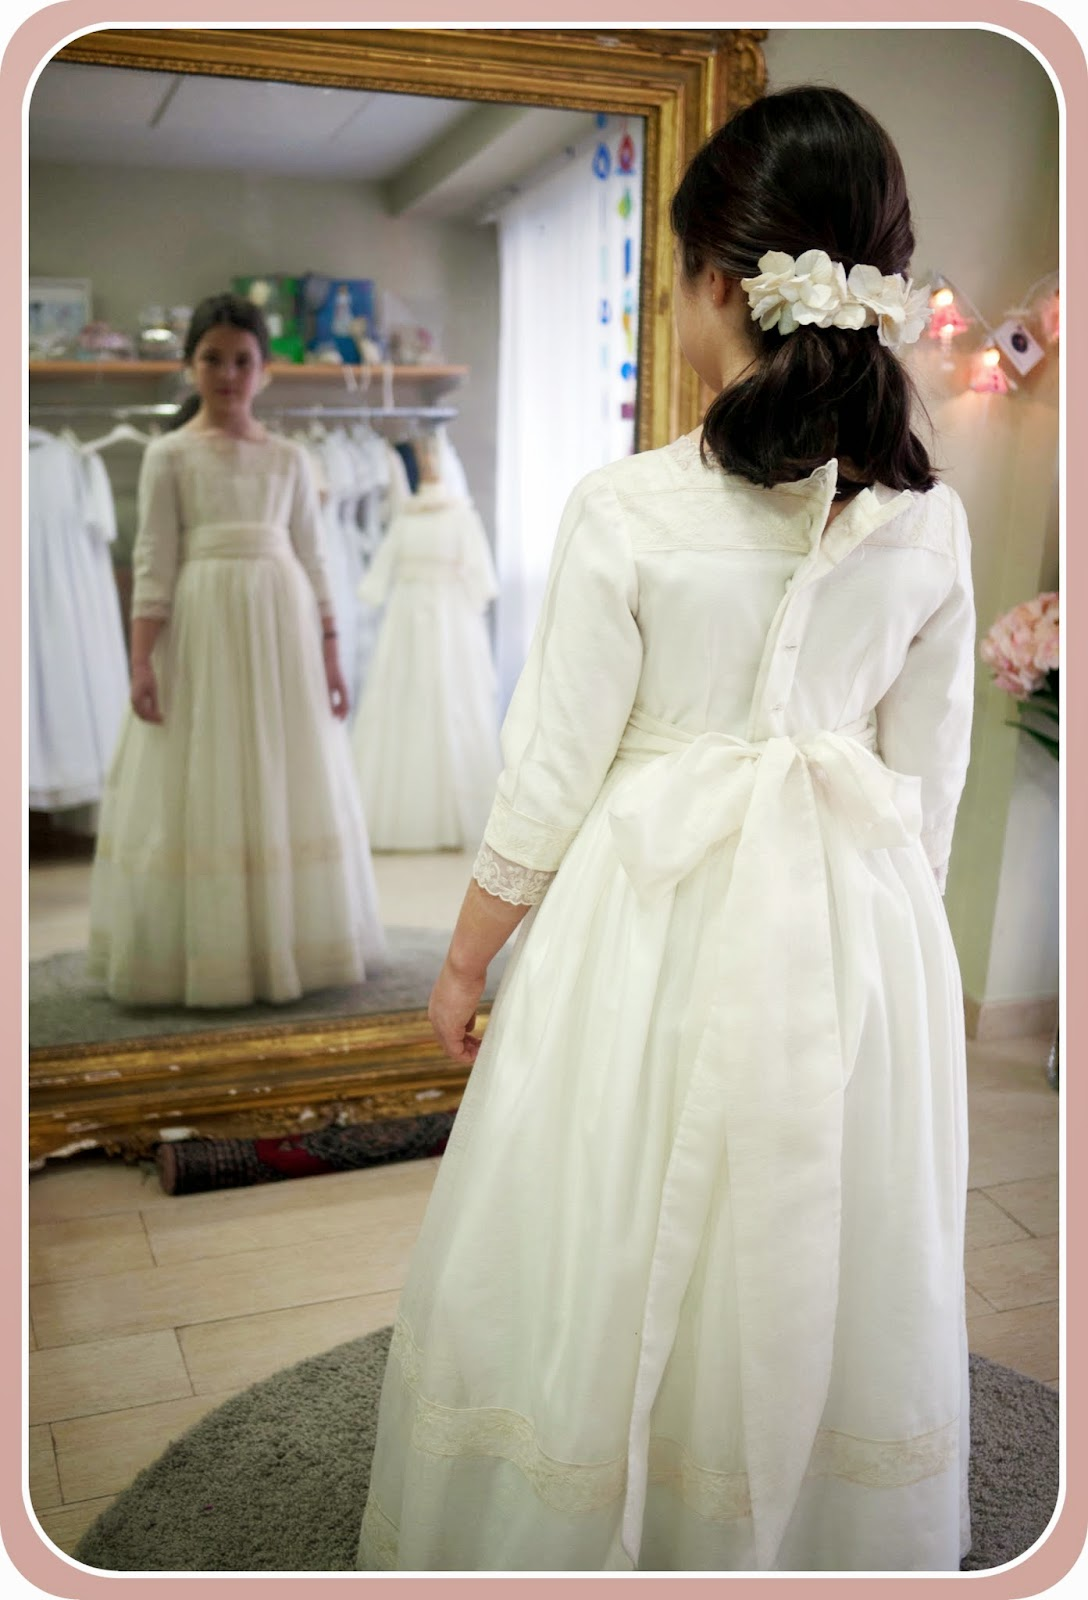 Comprar vestido mama comunion